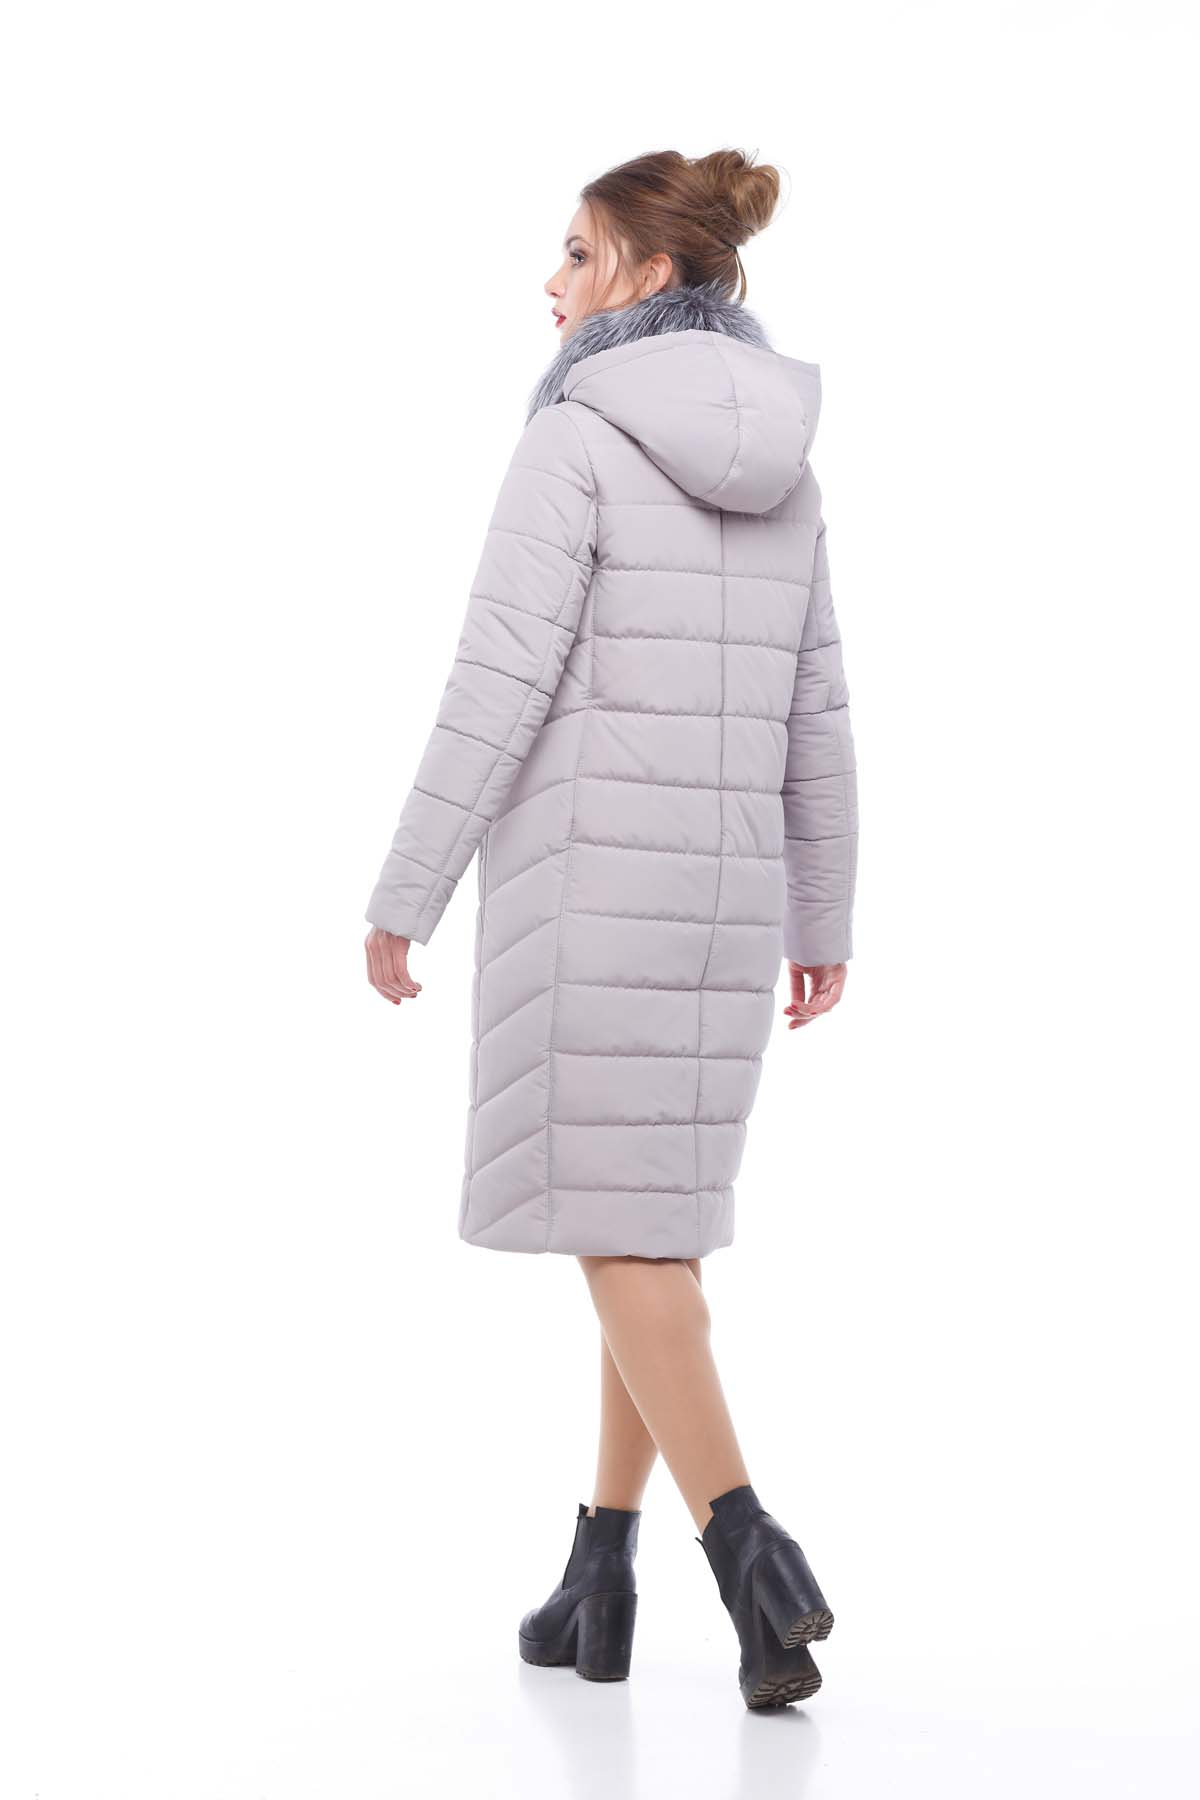 Зимове пальто стьогане Кім Зима, чорнобурка лаванда